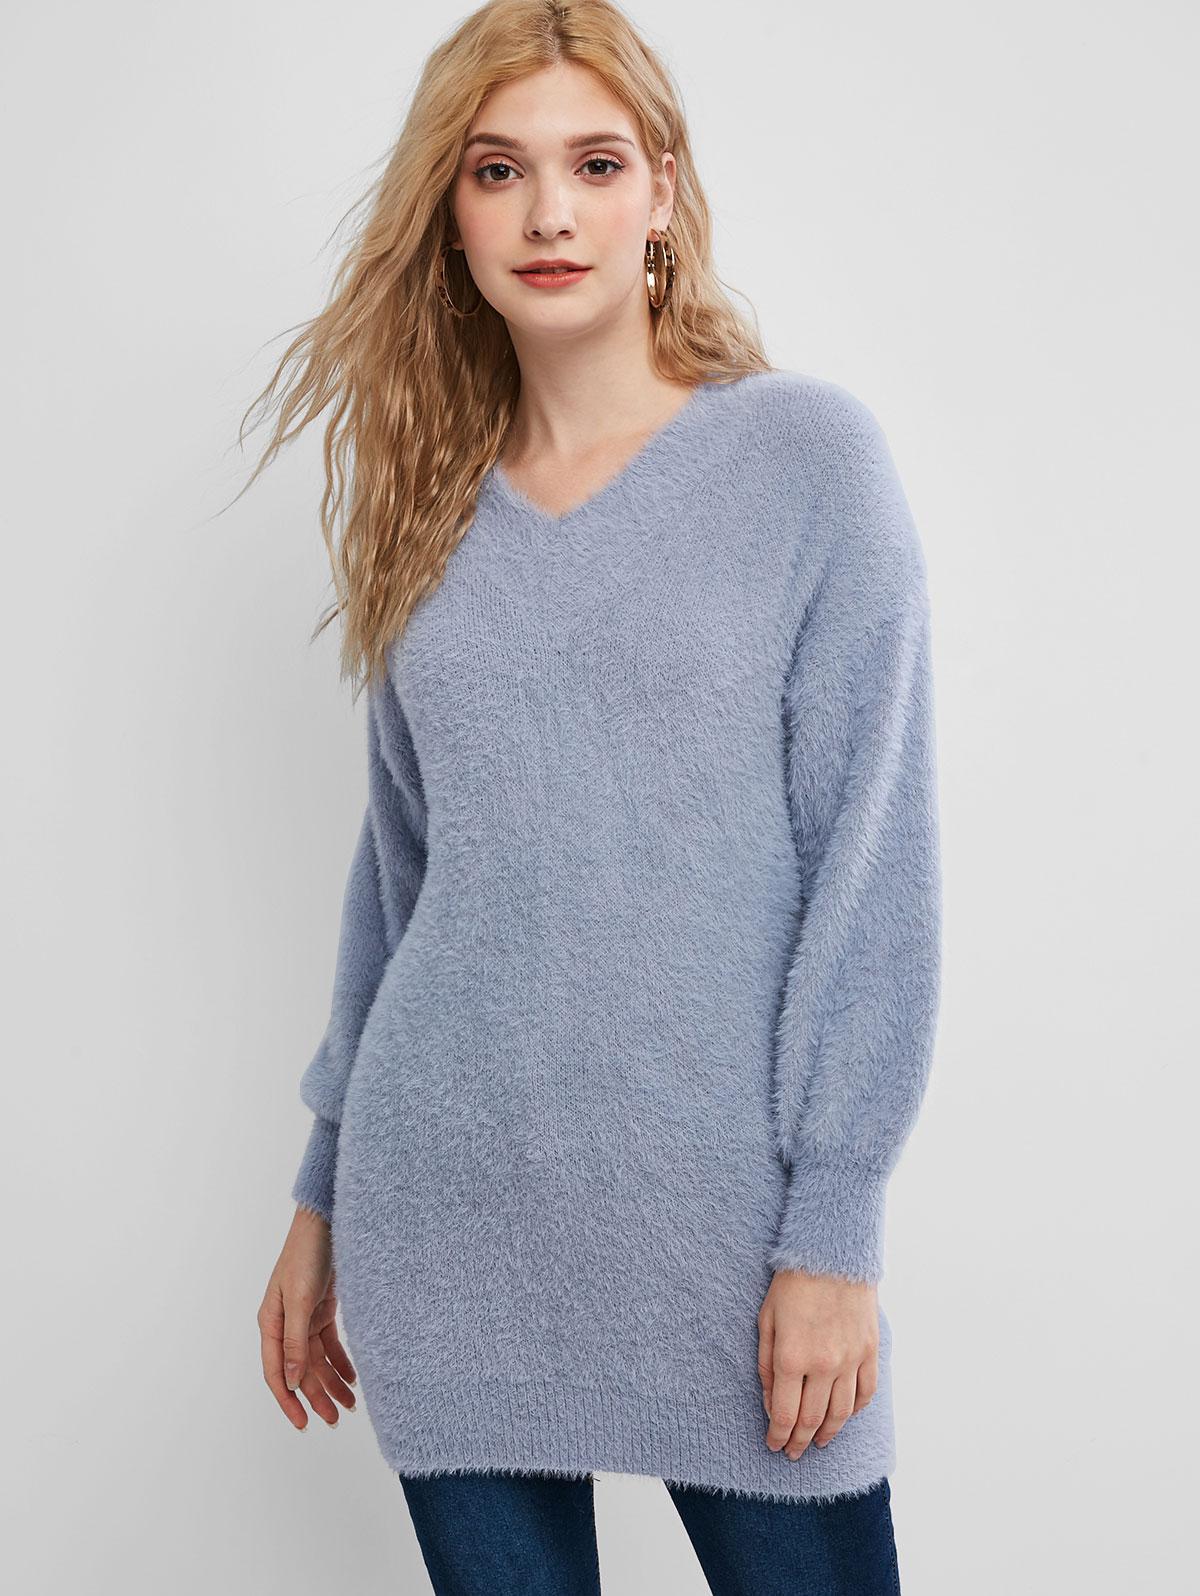 Drop Shoulder Fuzzy Tunic Knit Sweater